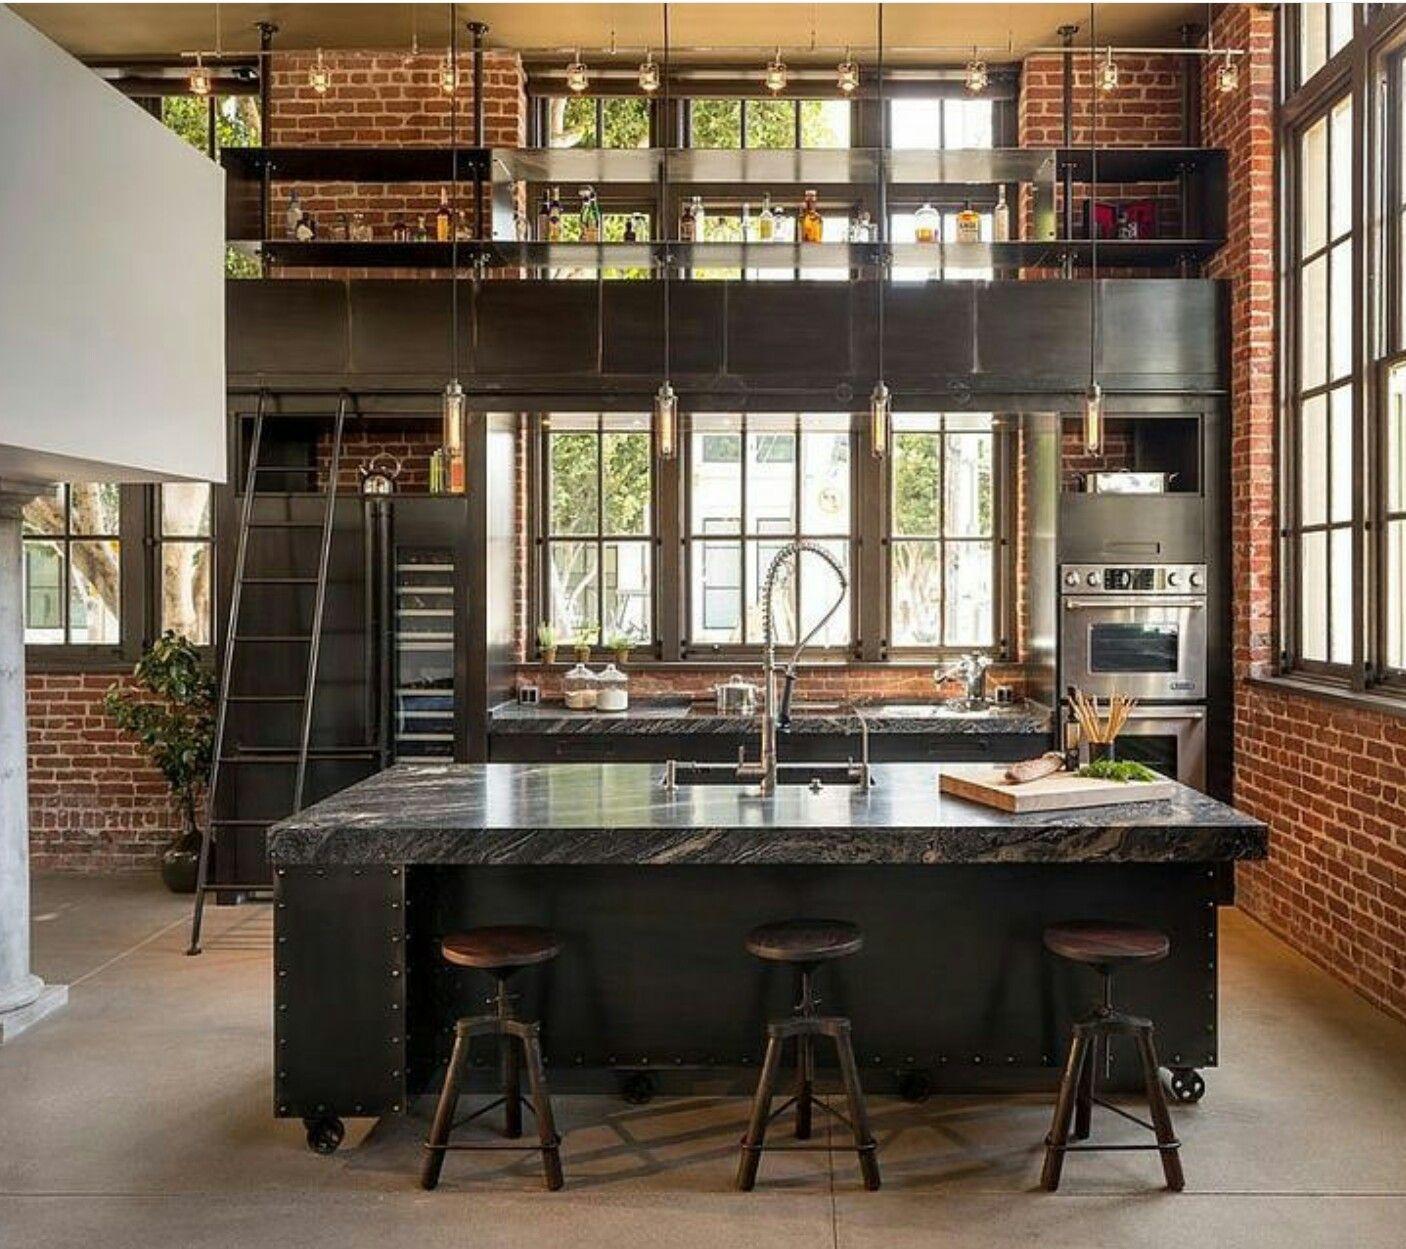 Pin By Kirti Maheshwari On Home Industrial Decor Kitchen